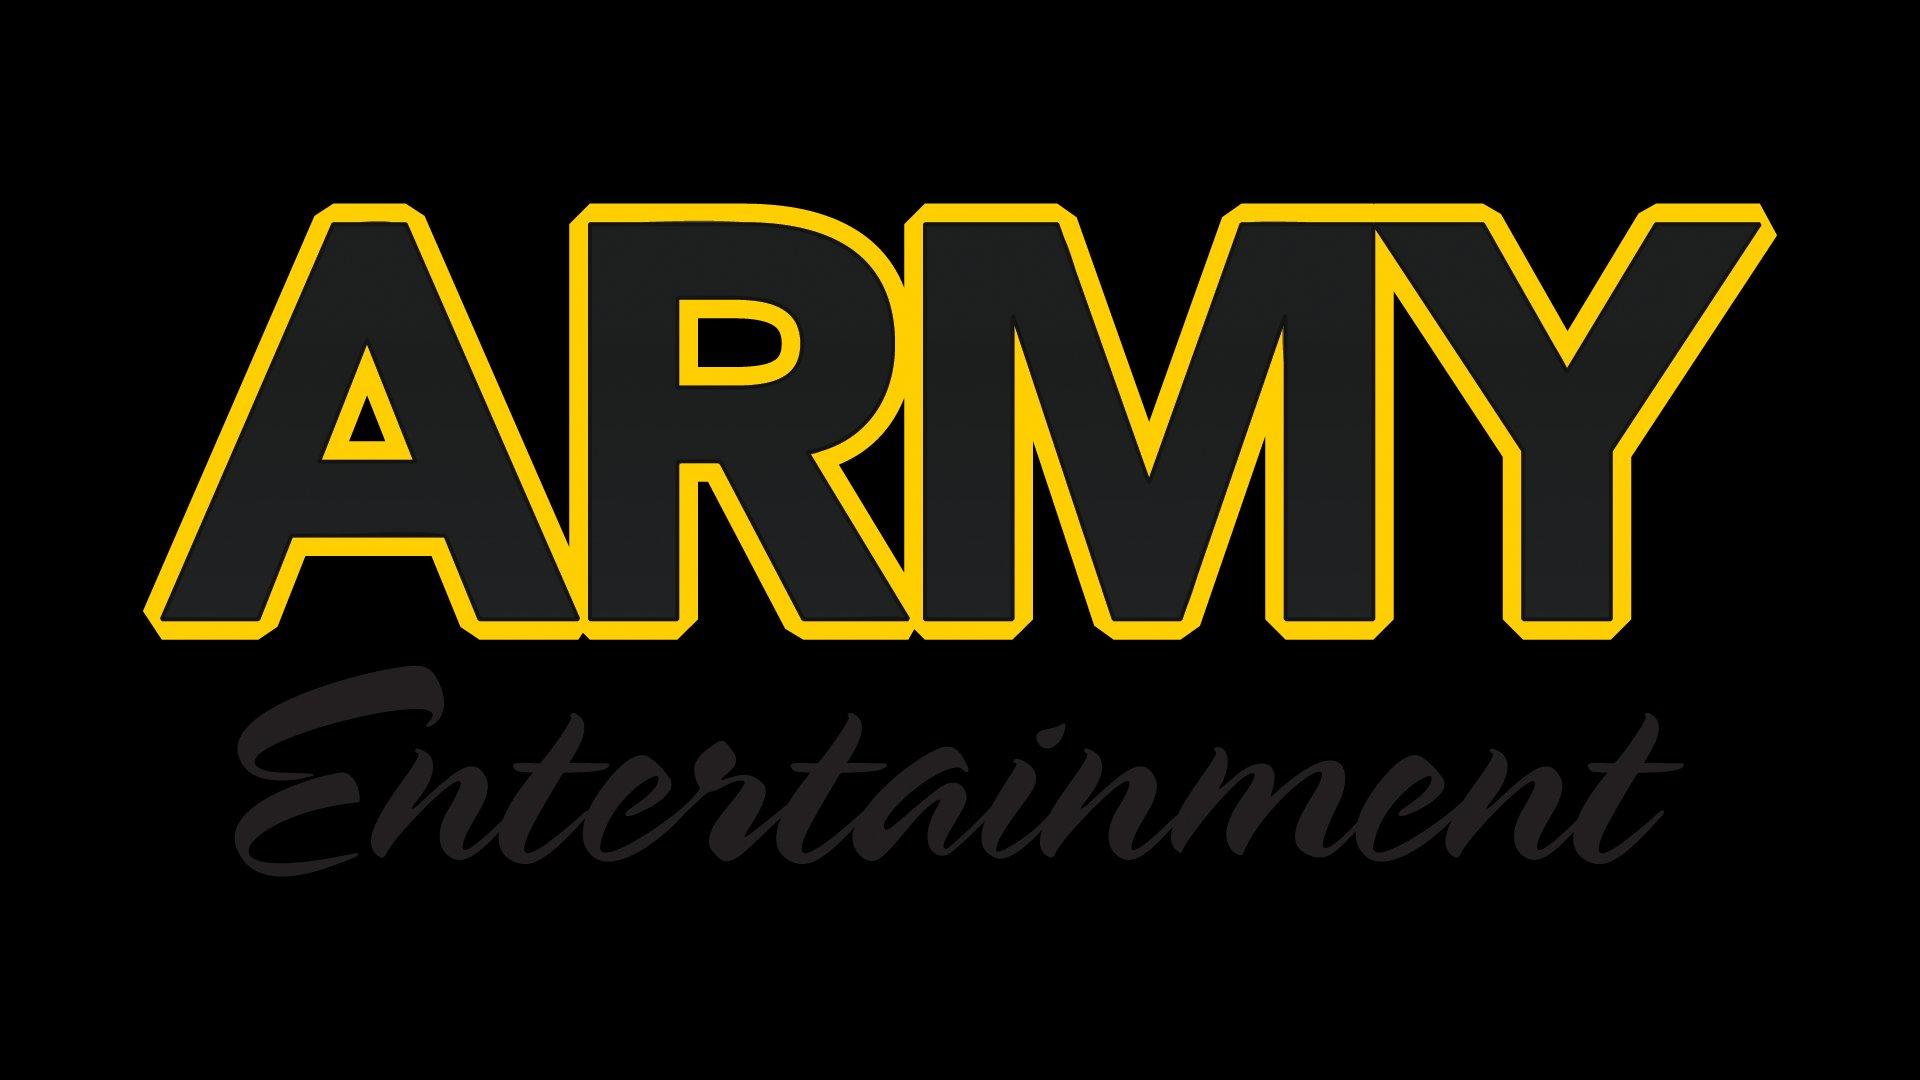 army logo wallpaper 1920x1080 wallpapersafari